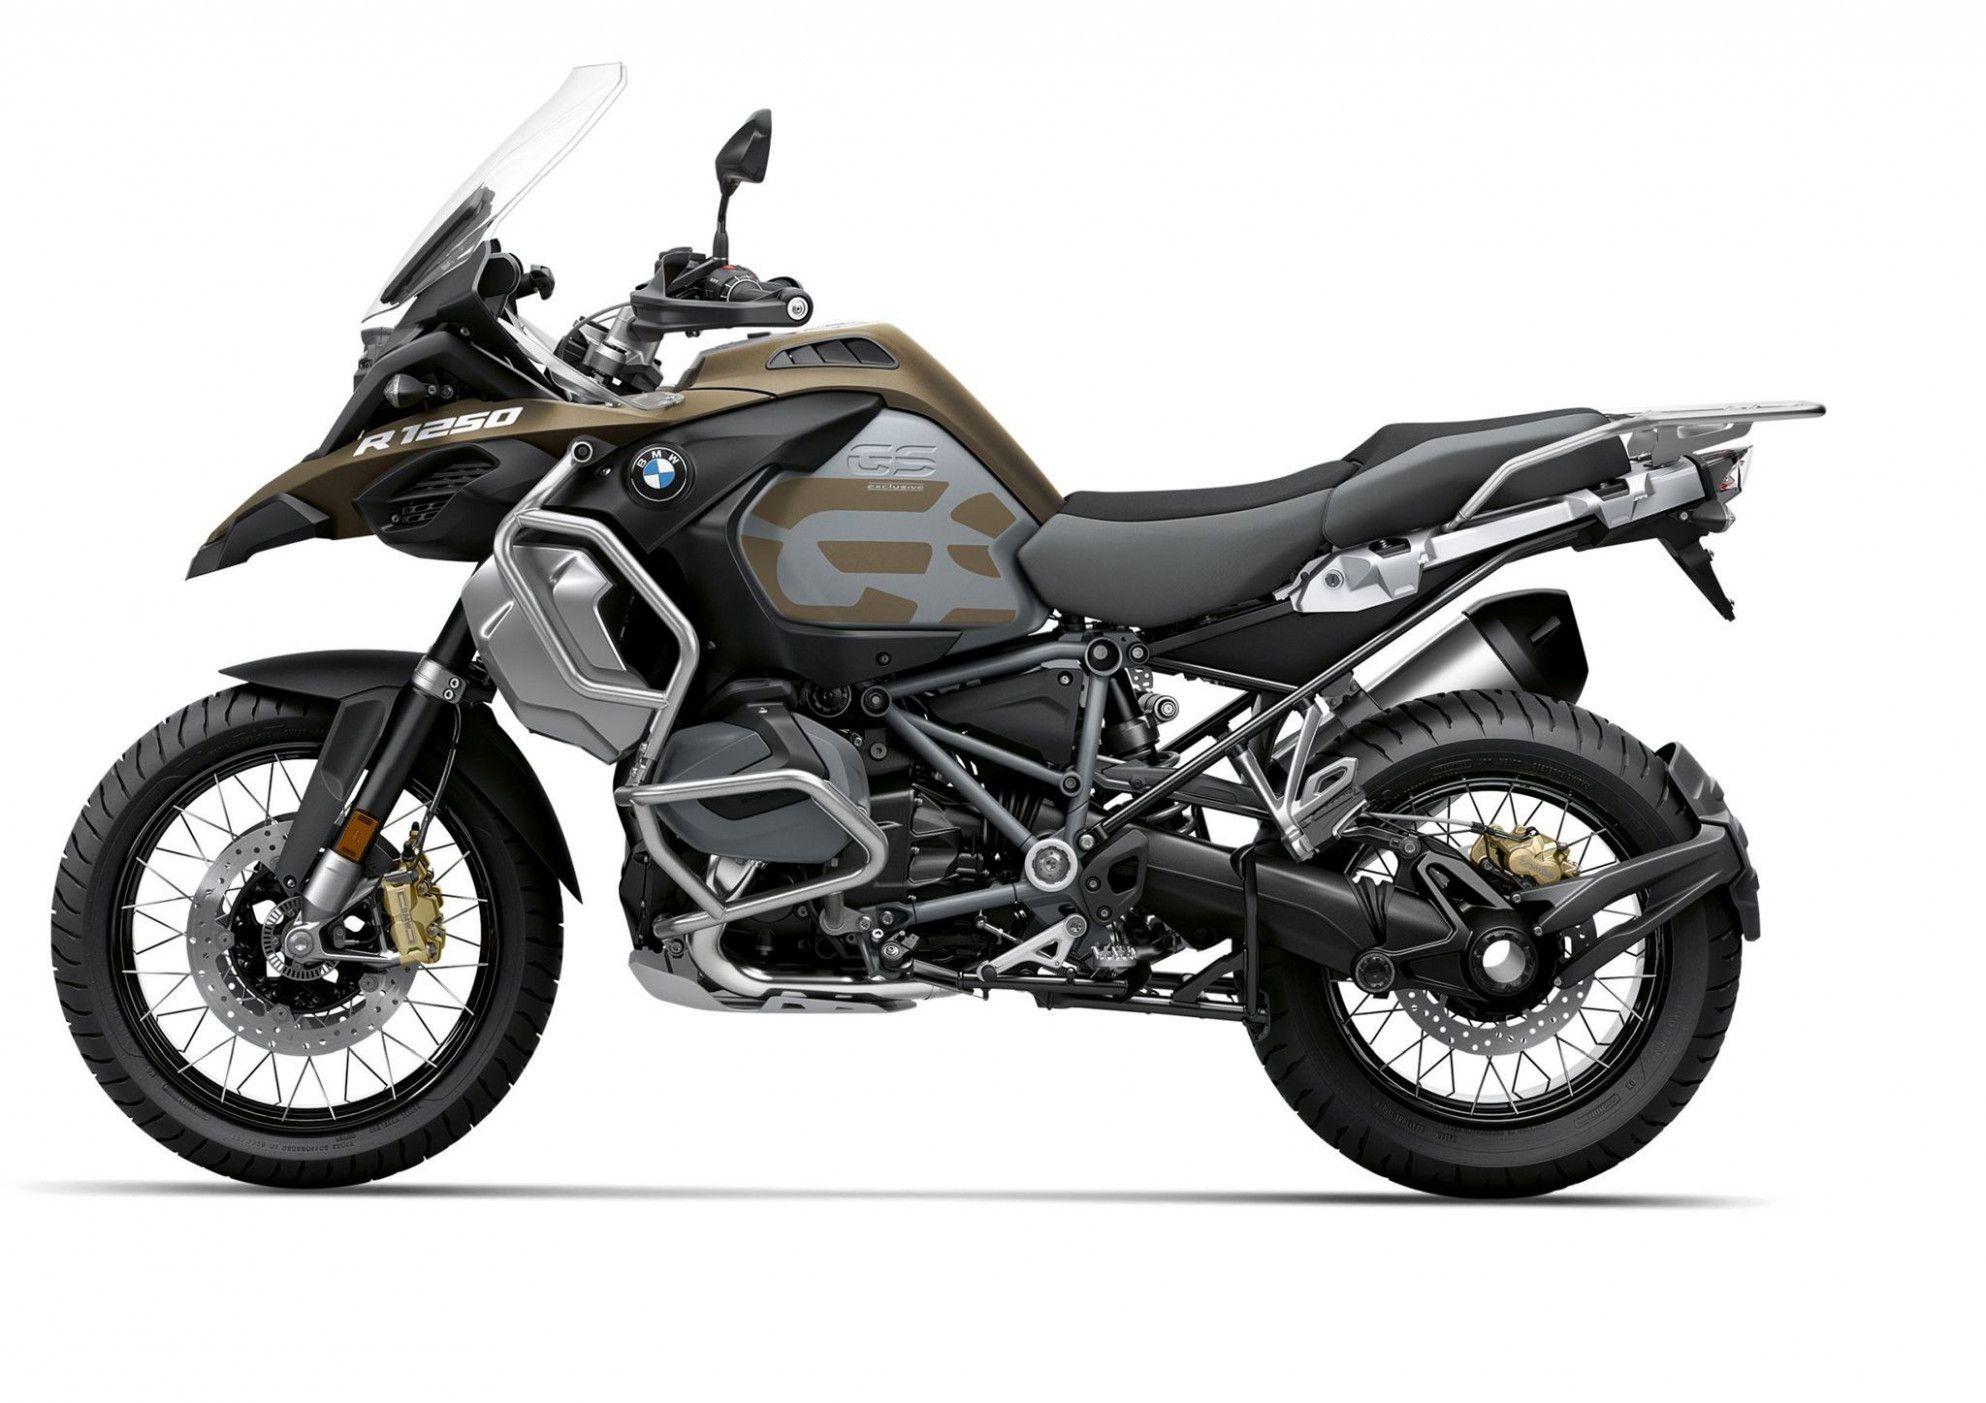 6 Image Bmw R1200gs 2020 In 2020 Bmw Motorrad Bmw Motorbikes Bmw